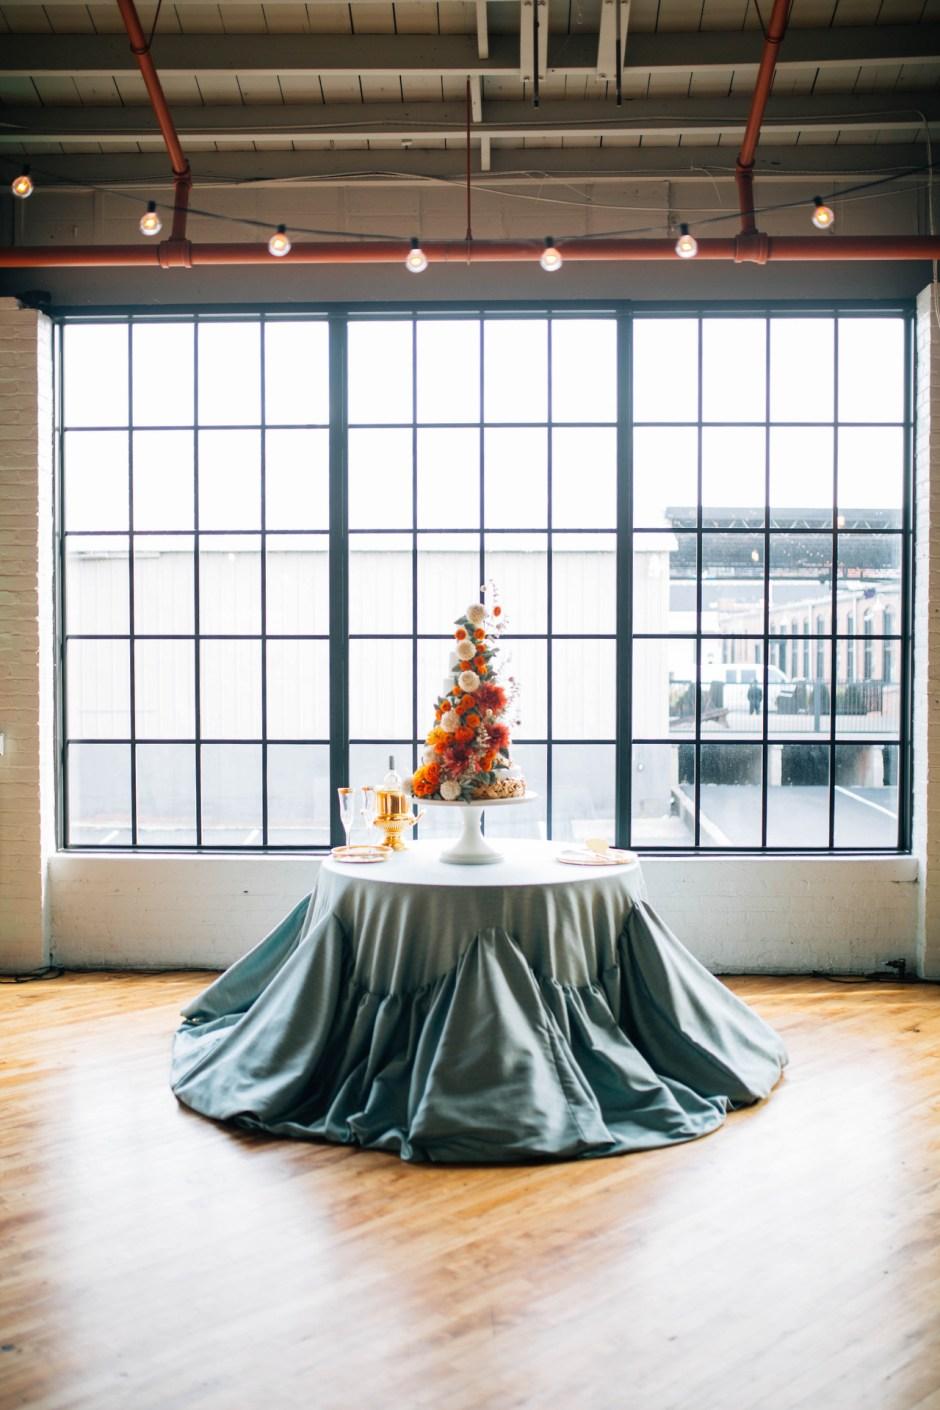 Fall Sugar Flower Wedding Cake I Mischief Maker Cakes #sugarflower #sugarflowerweddingcake #mischiefmakercakes #themischiefmaker #bemischievious #luxury #luxuryweddingcake #luxurywedding #dahlia